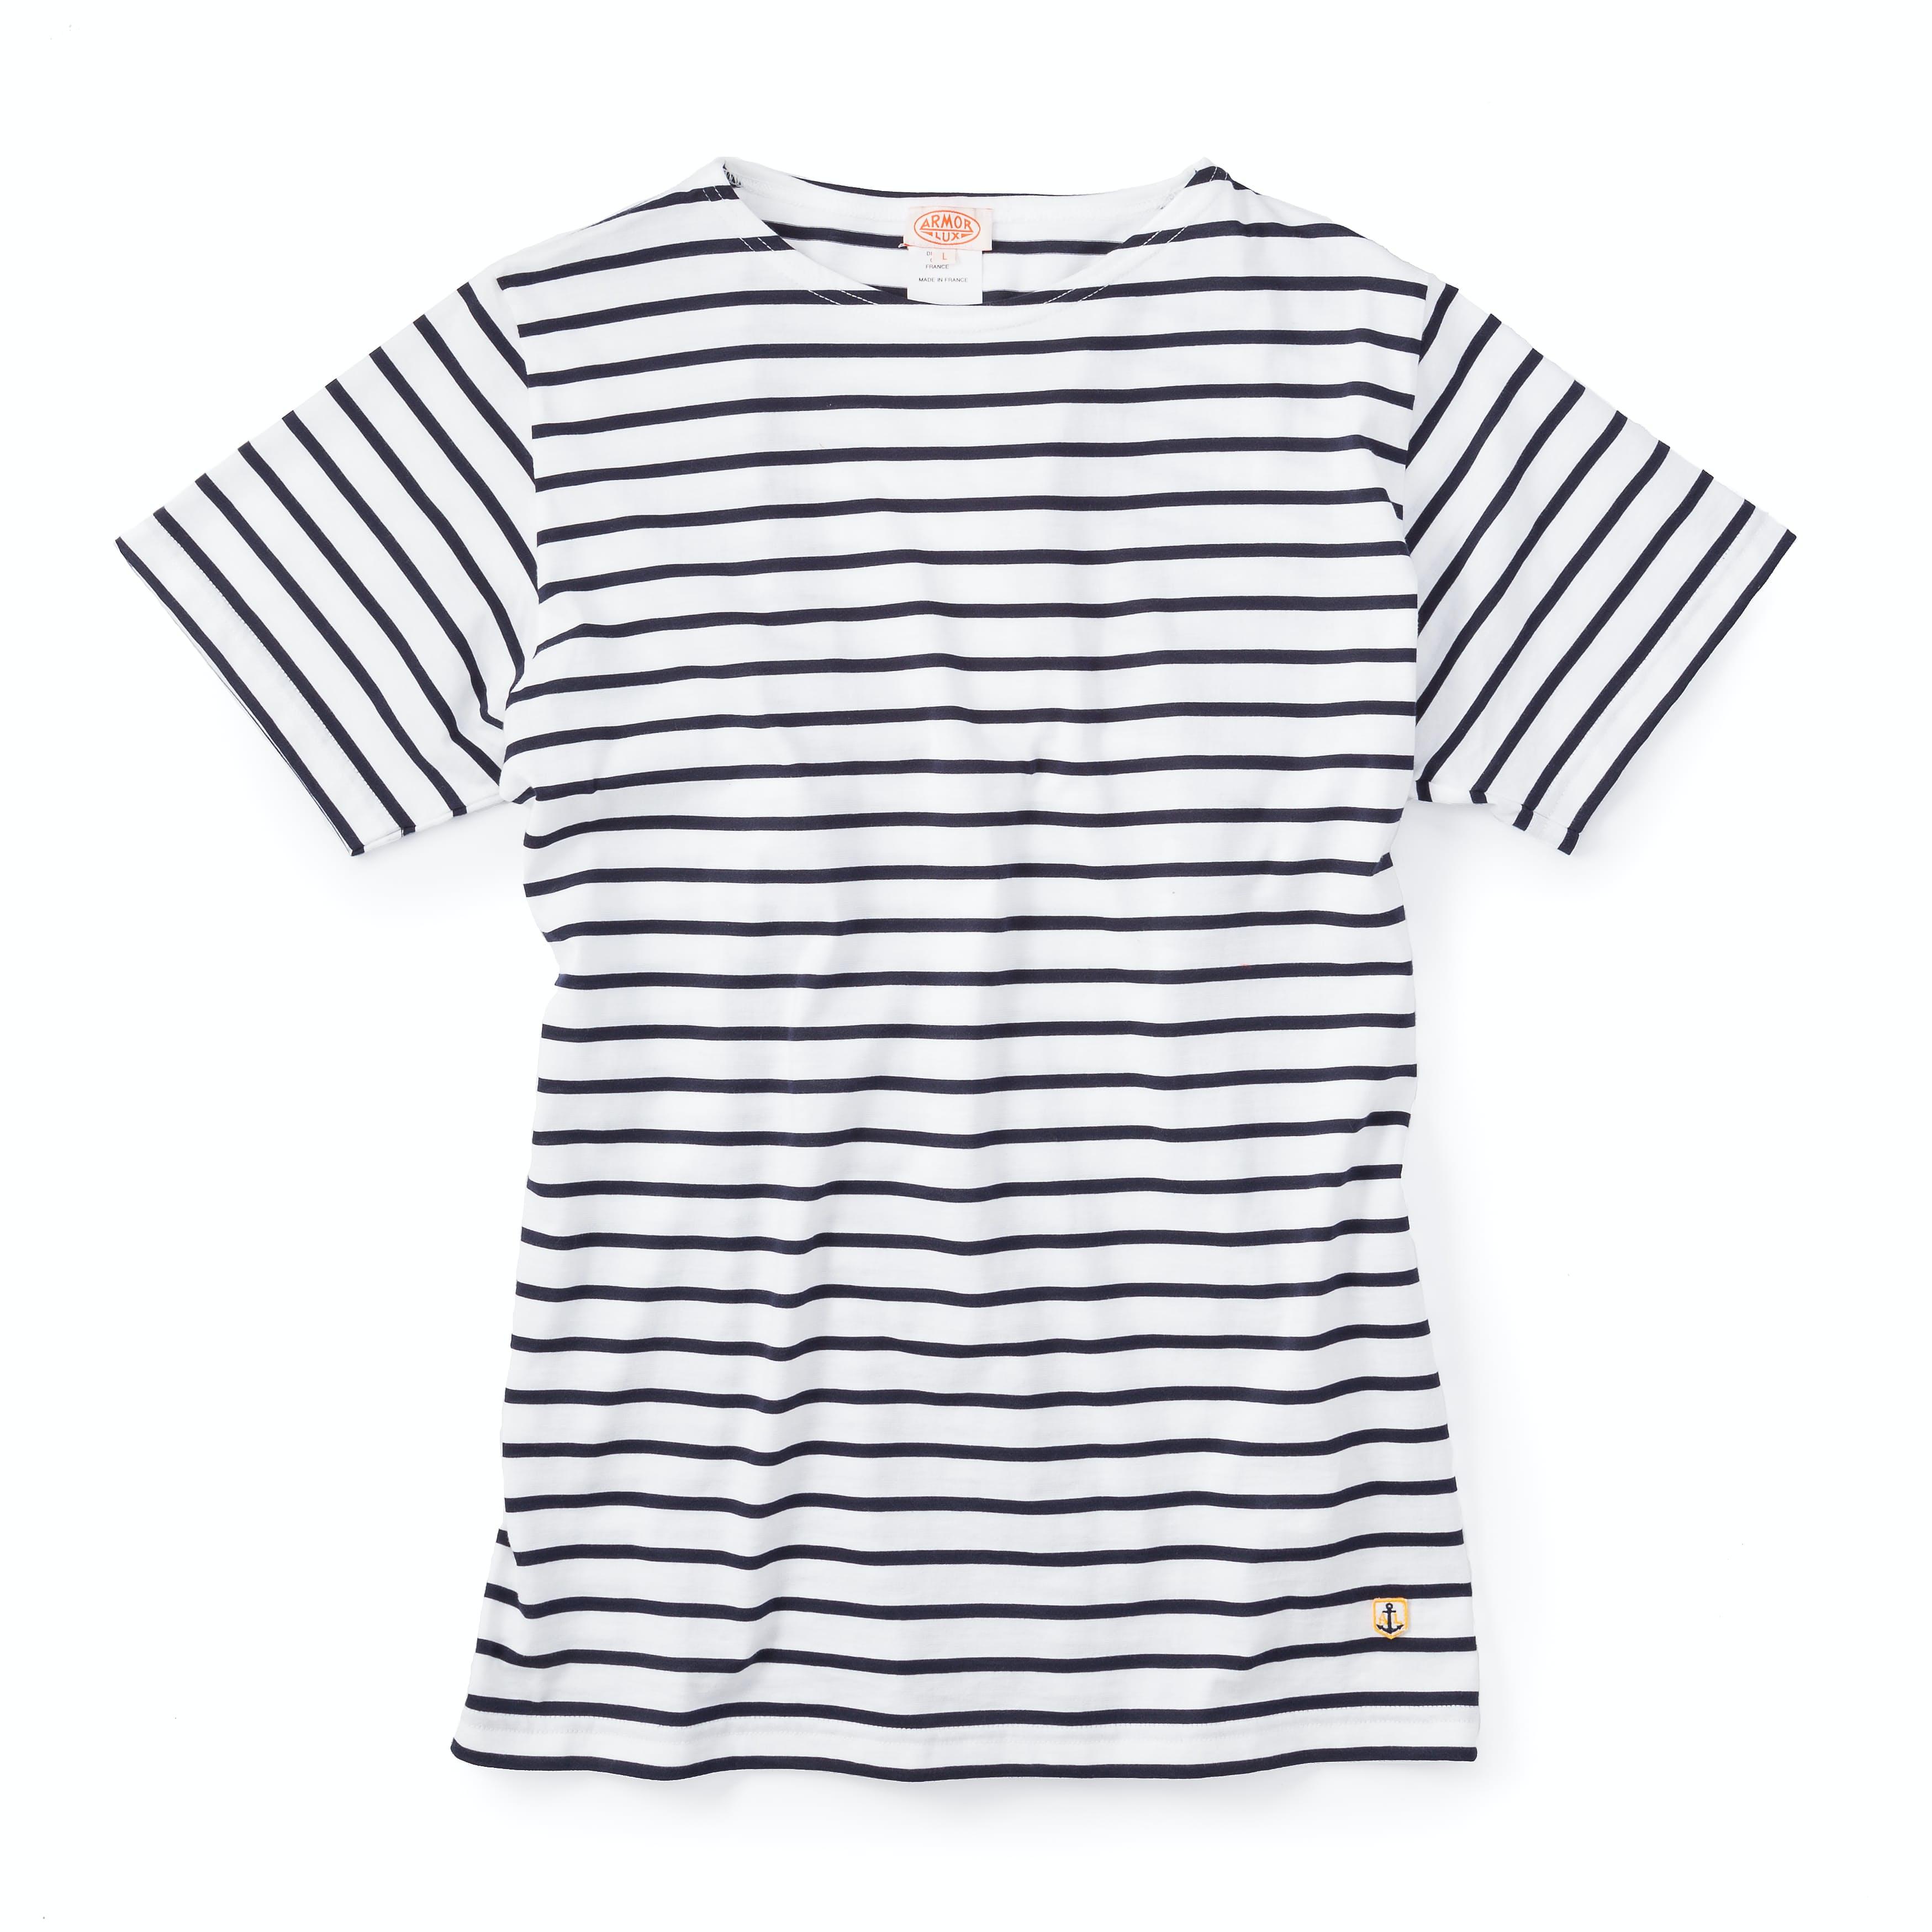 Dijy3udjrb armor lux s s breton shirt 0 original